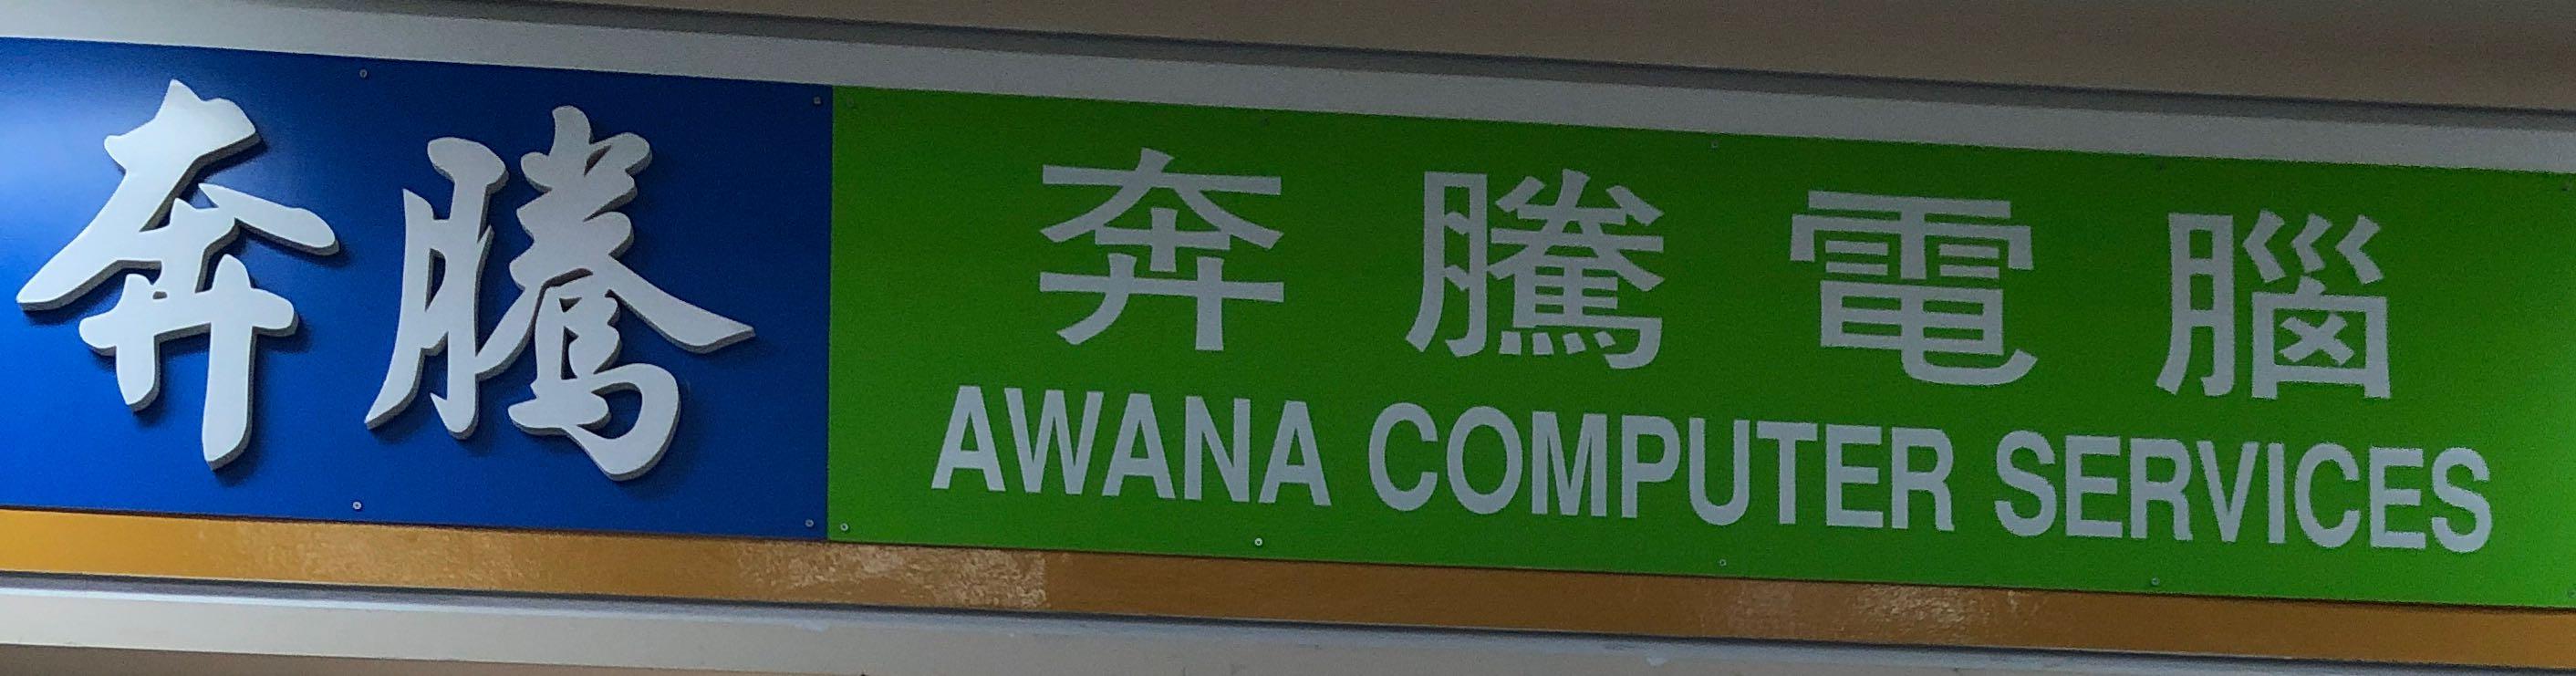 Awana Computer Services